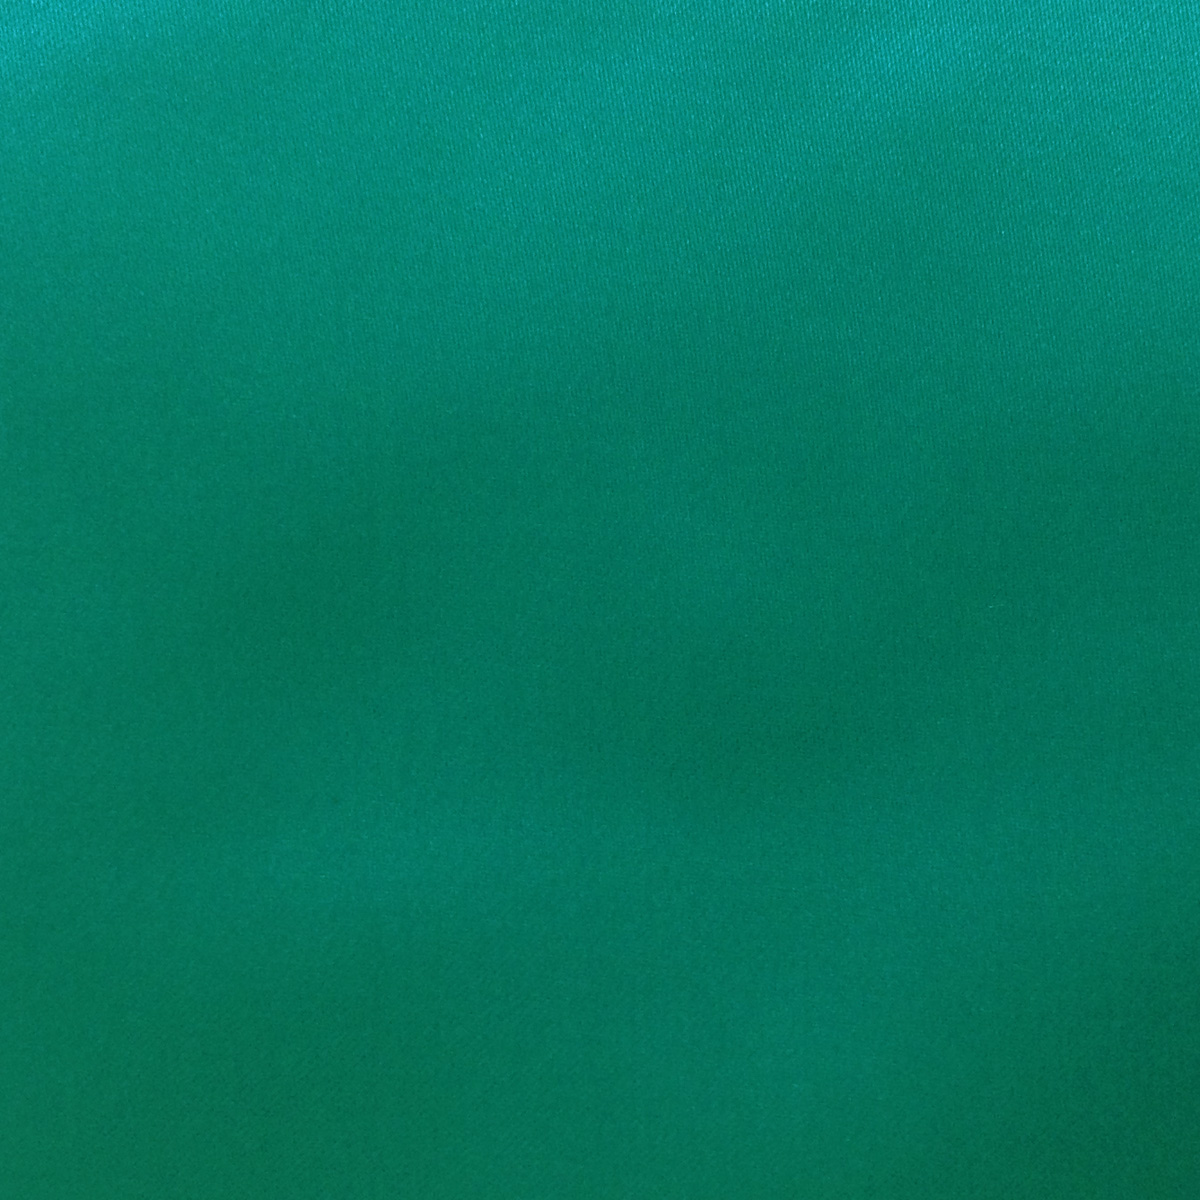 B1764 07 teal mens ties facemasks con murphys menswear cork - - Con Murphys Menswear